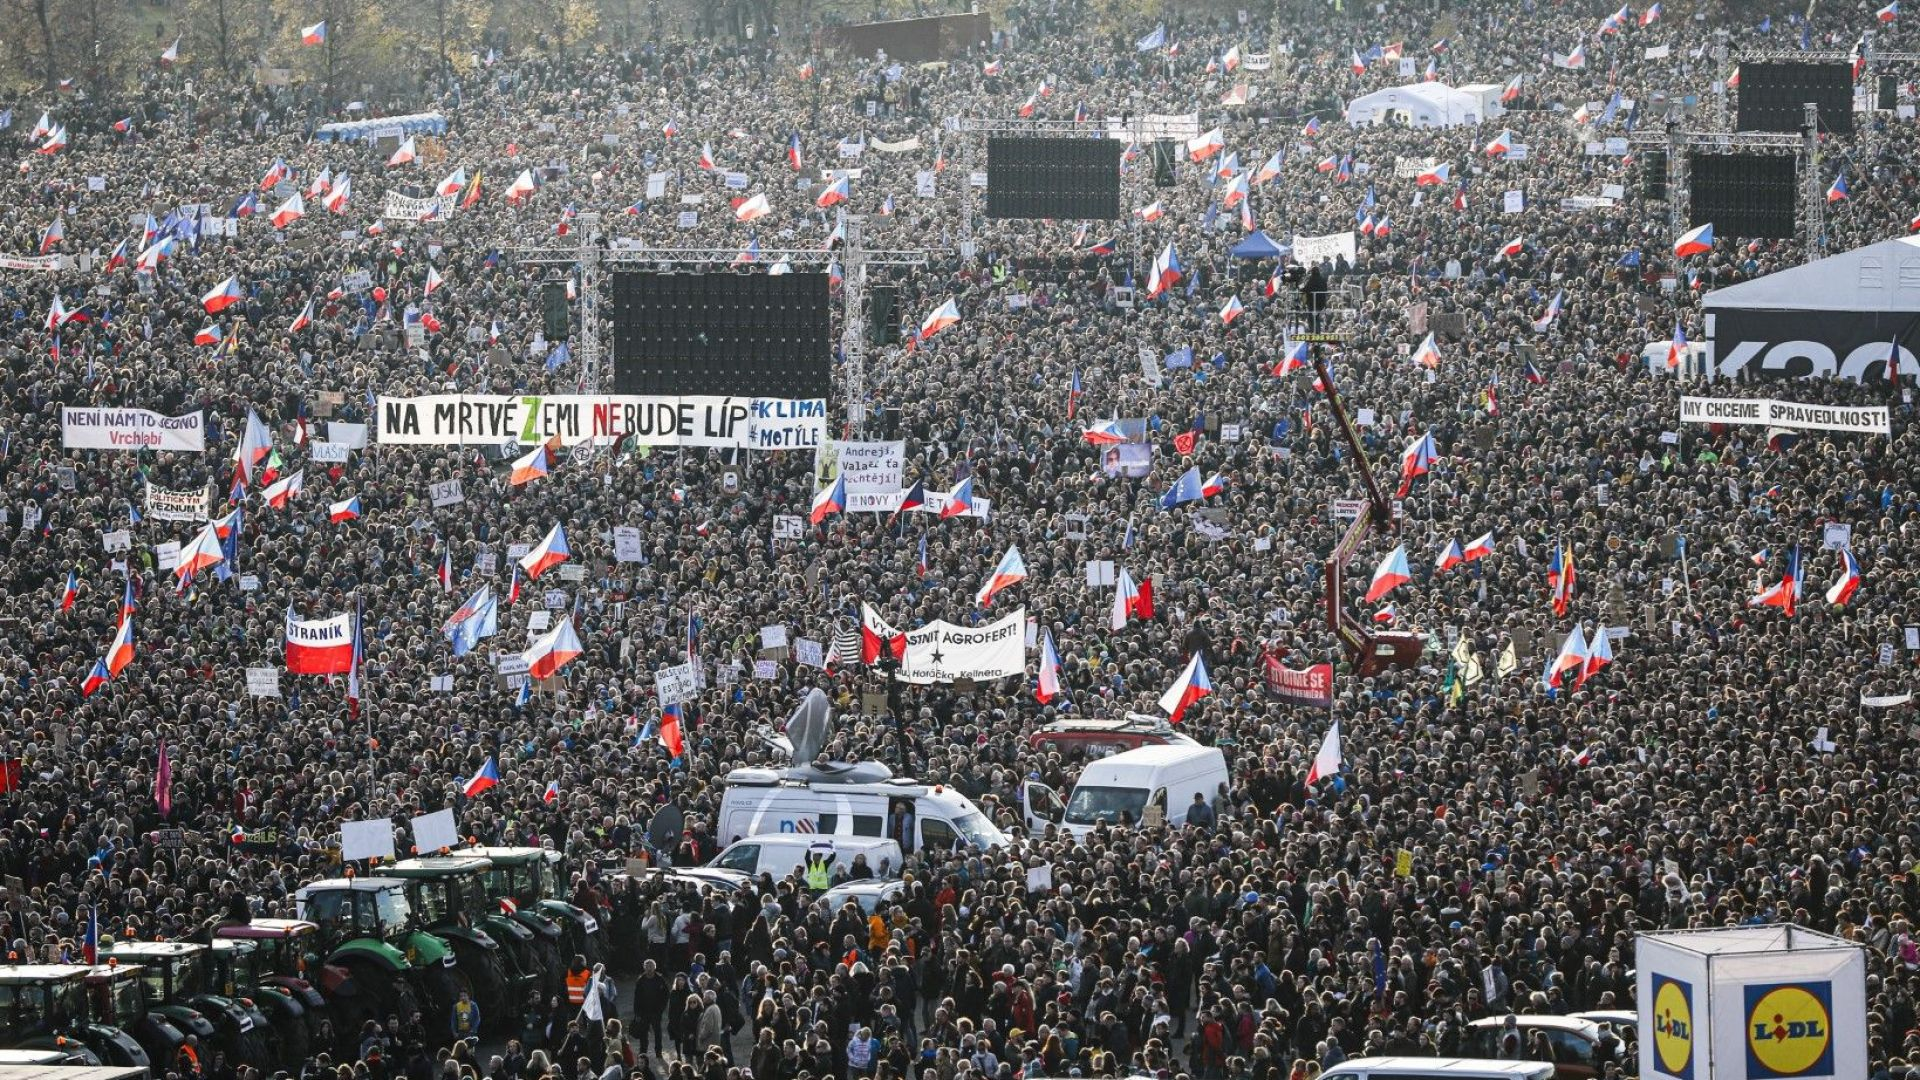 Десетки хиляди излязоха на протест в Чехия срещу премиера Андрей Бабиш